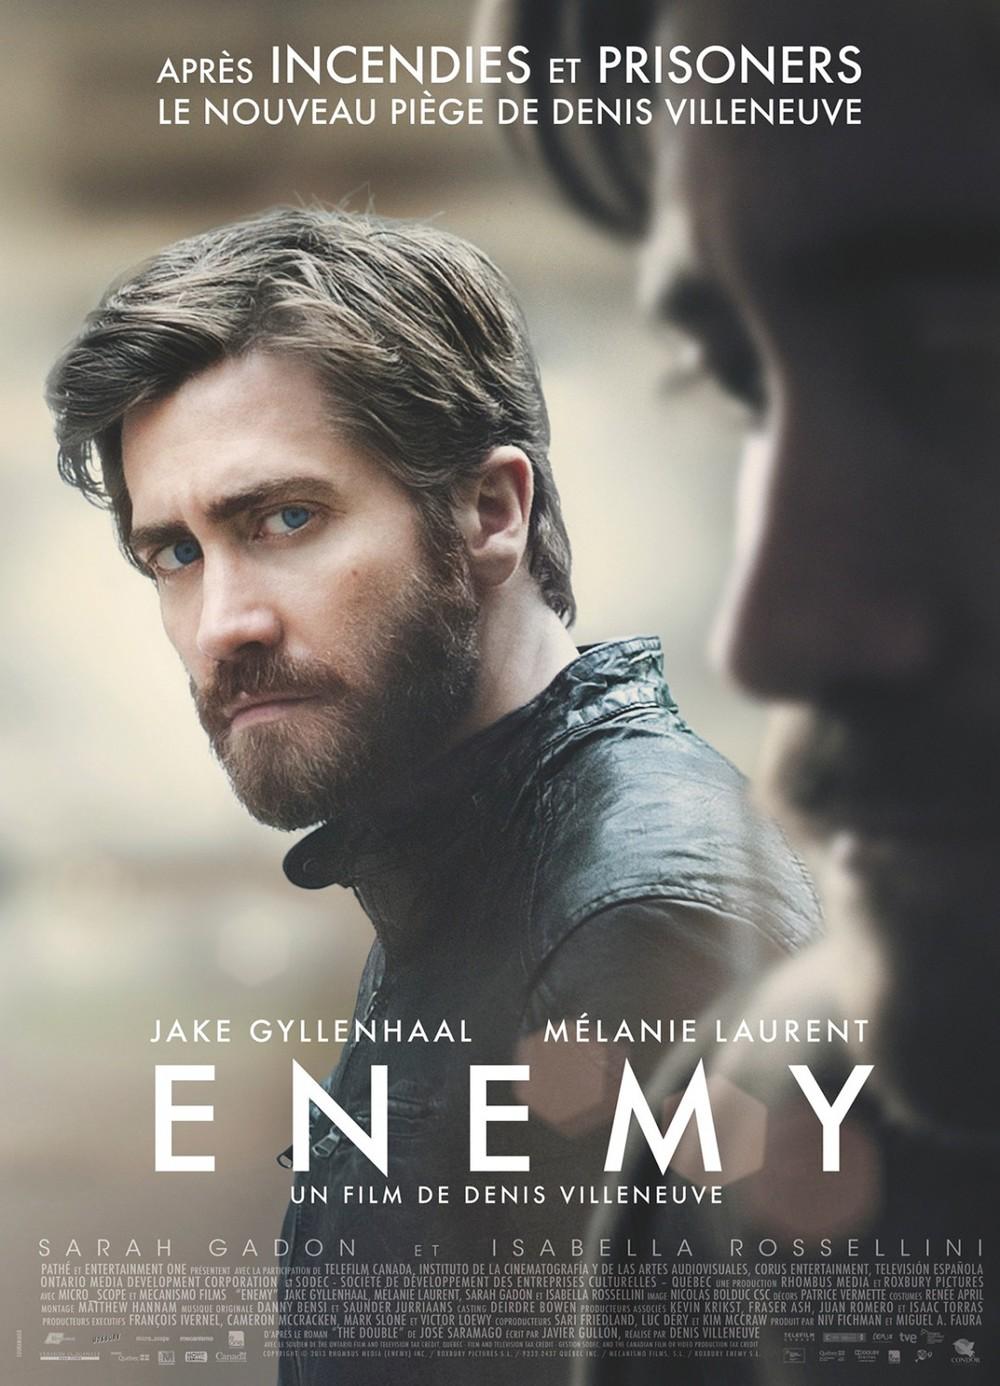 enemy_ver7_xlg.jpg